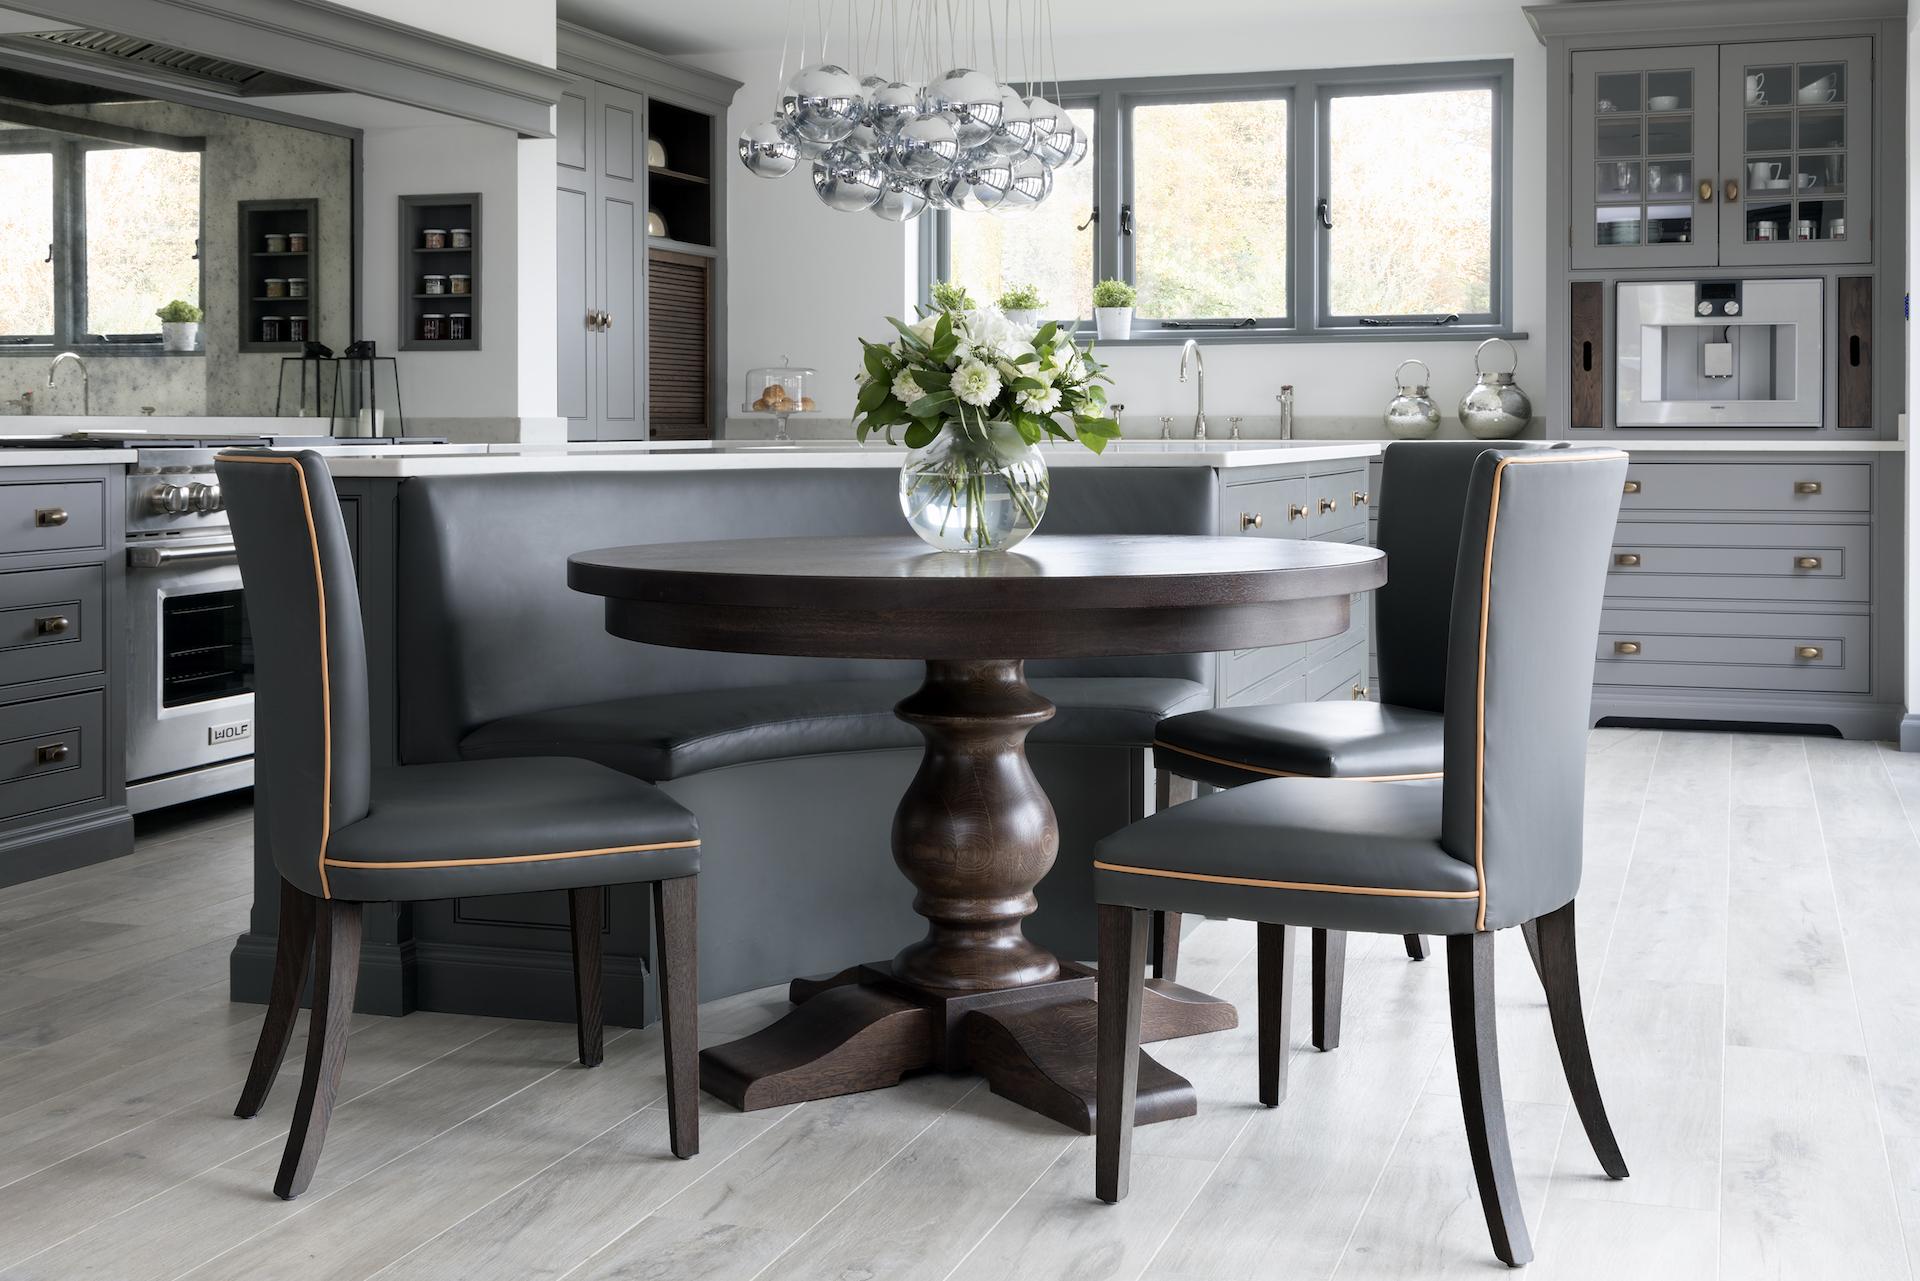 Banquette Seating - Design Notes - Humphrey Munson Blog